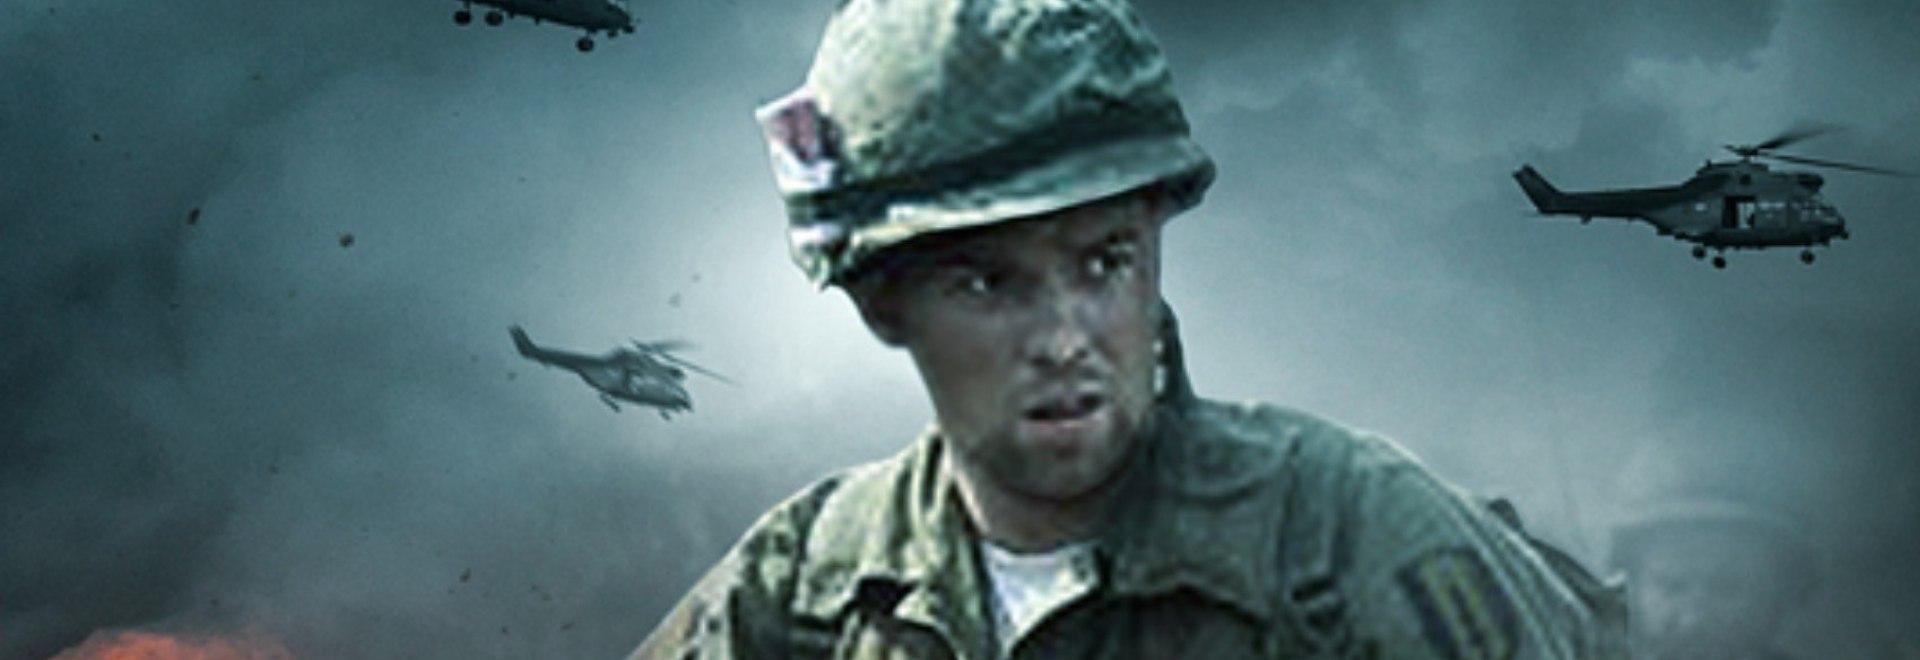 The Soldier - Operazione Vietnam